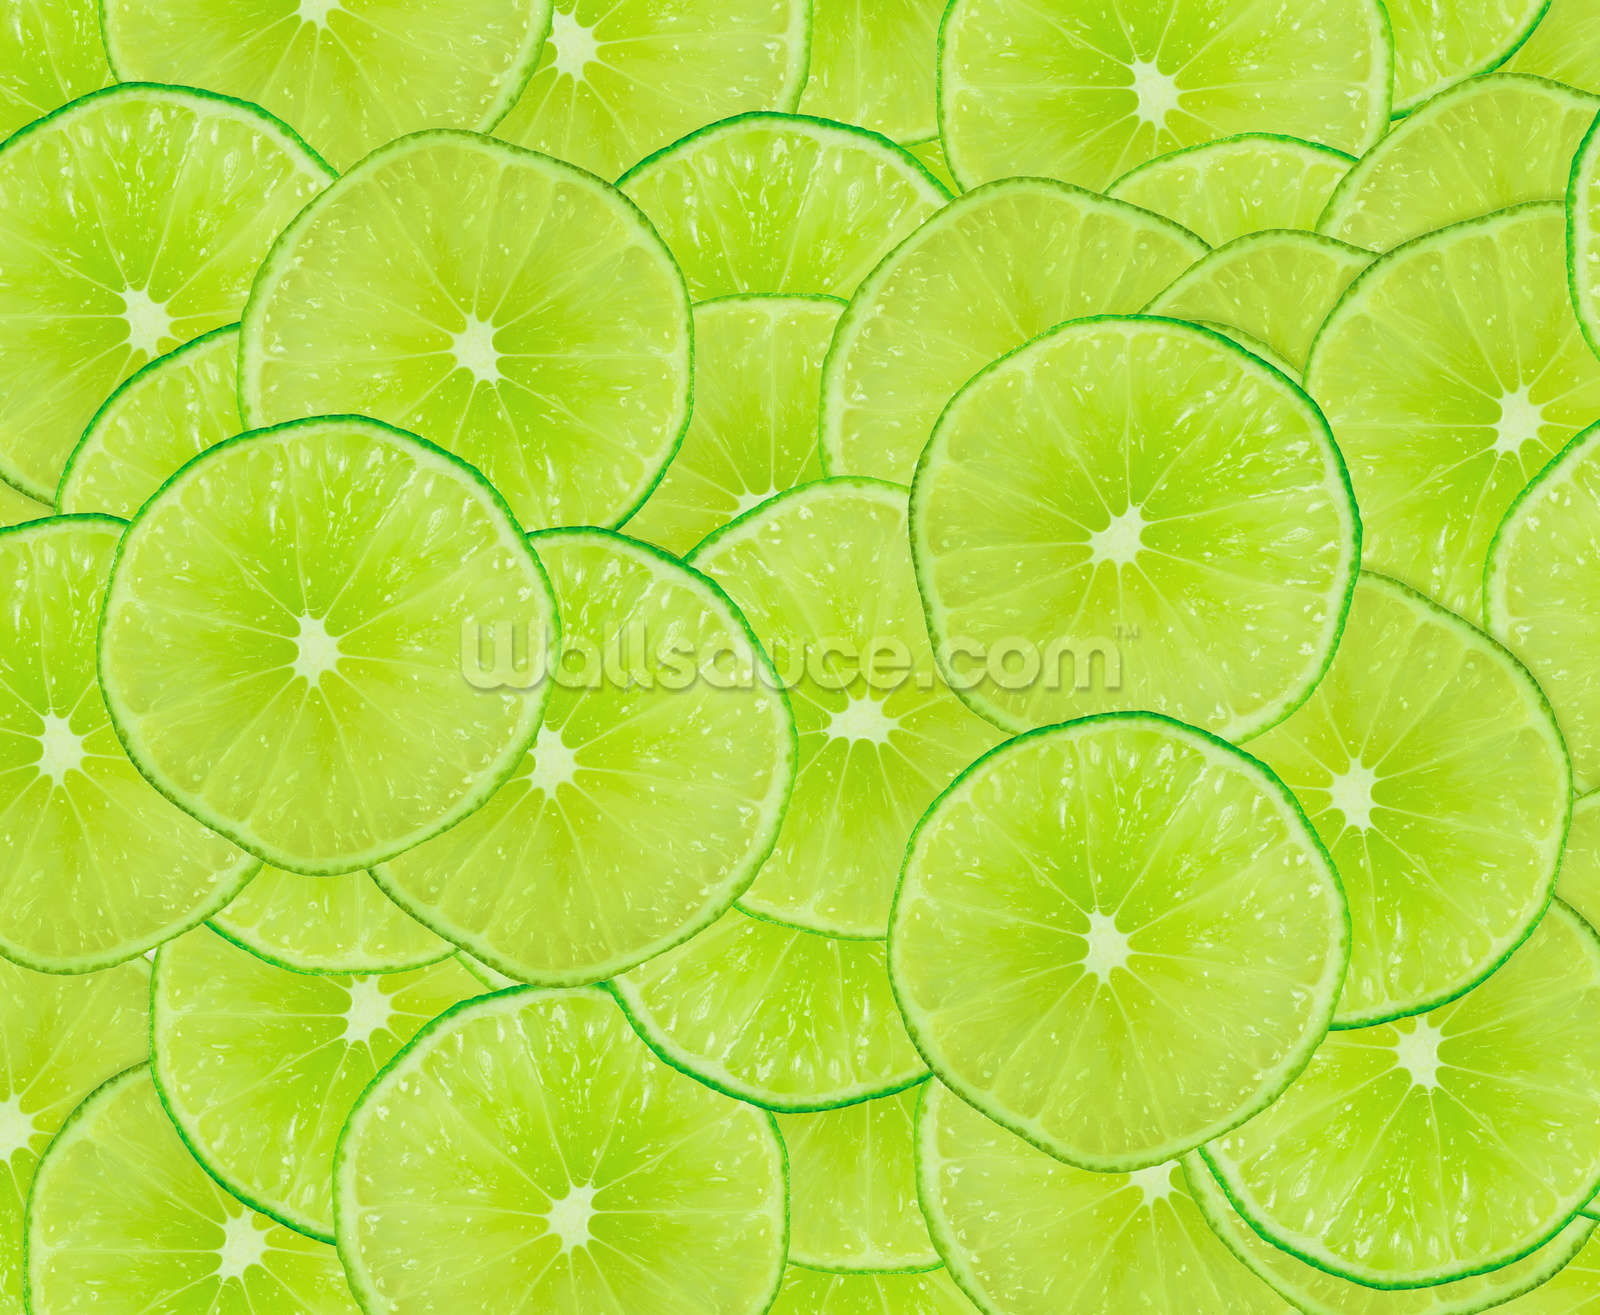 Limes wallpaper wall mural wallsauce for Lime green wallpaper for walls